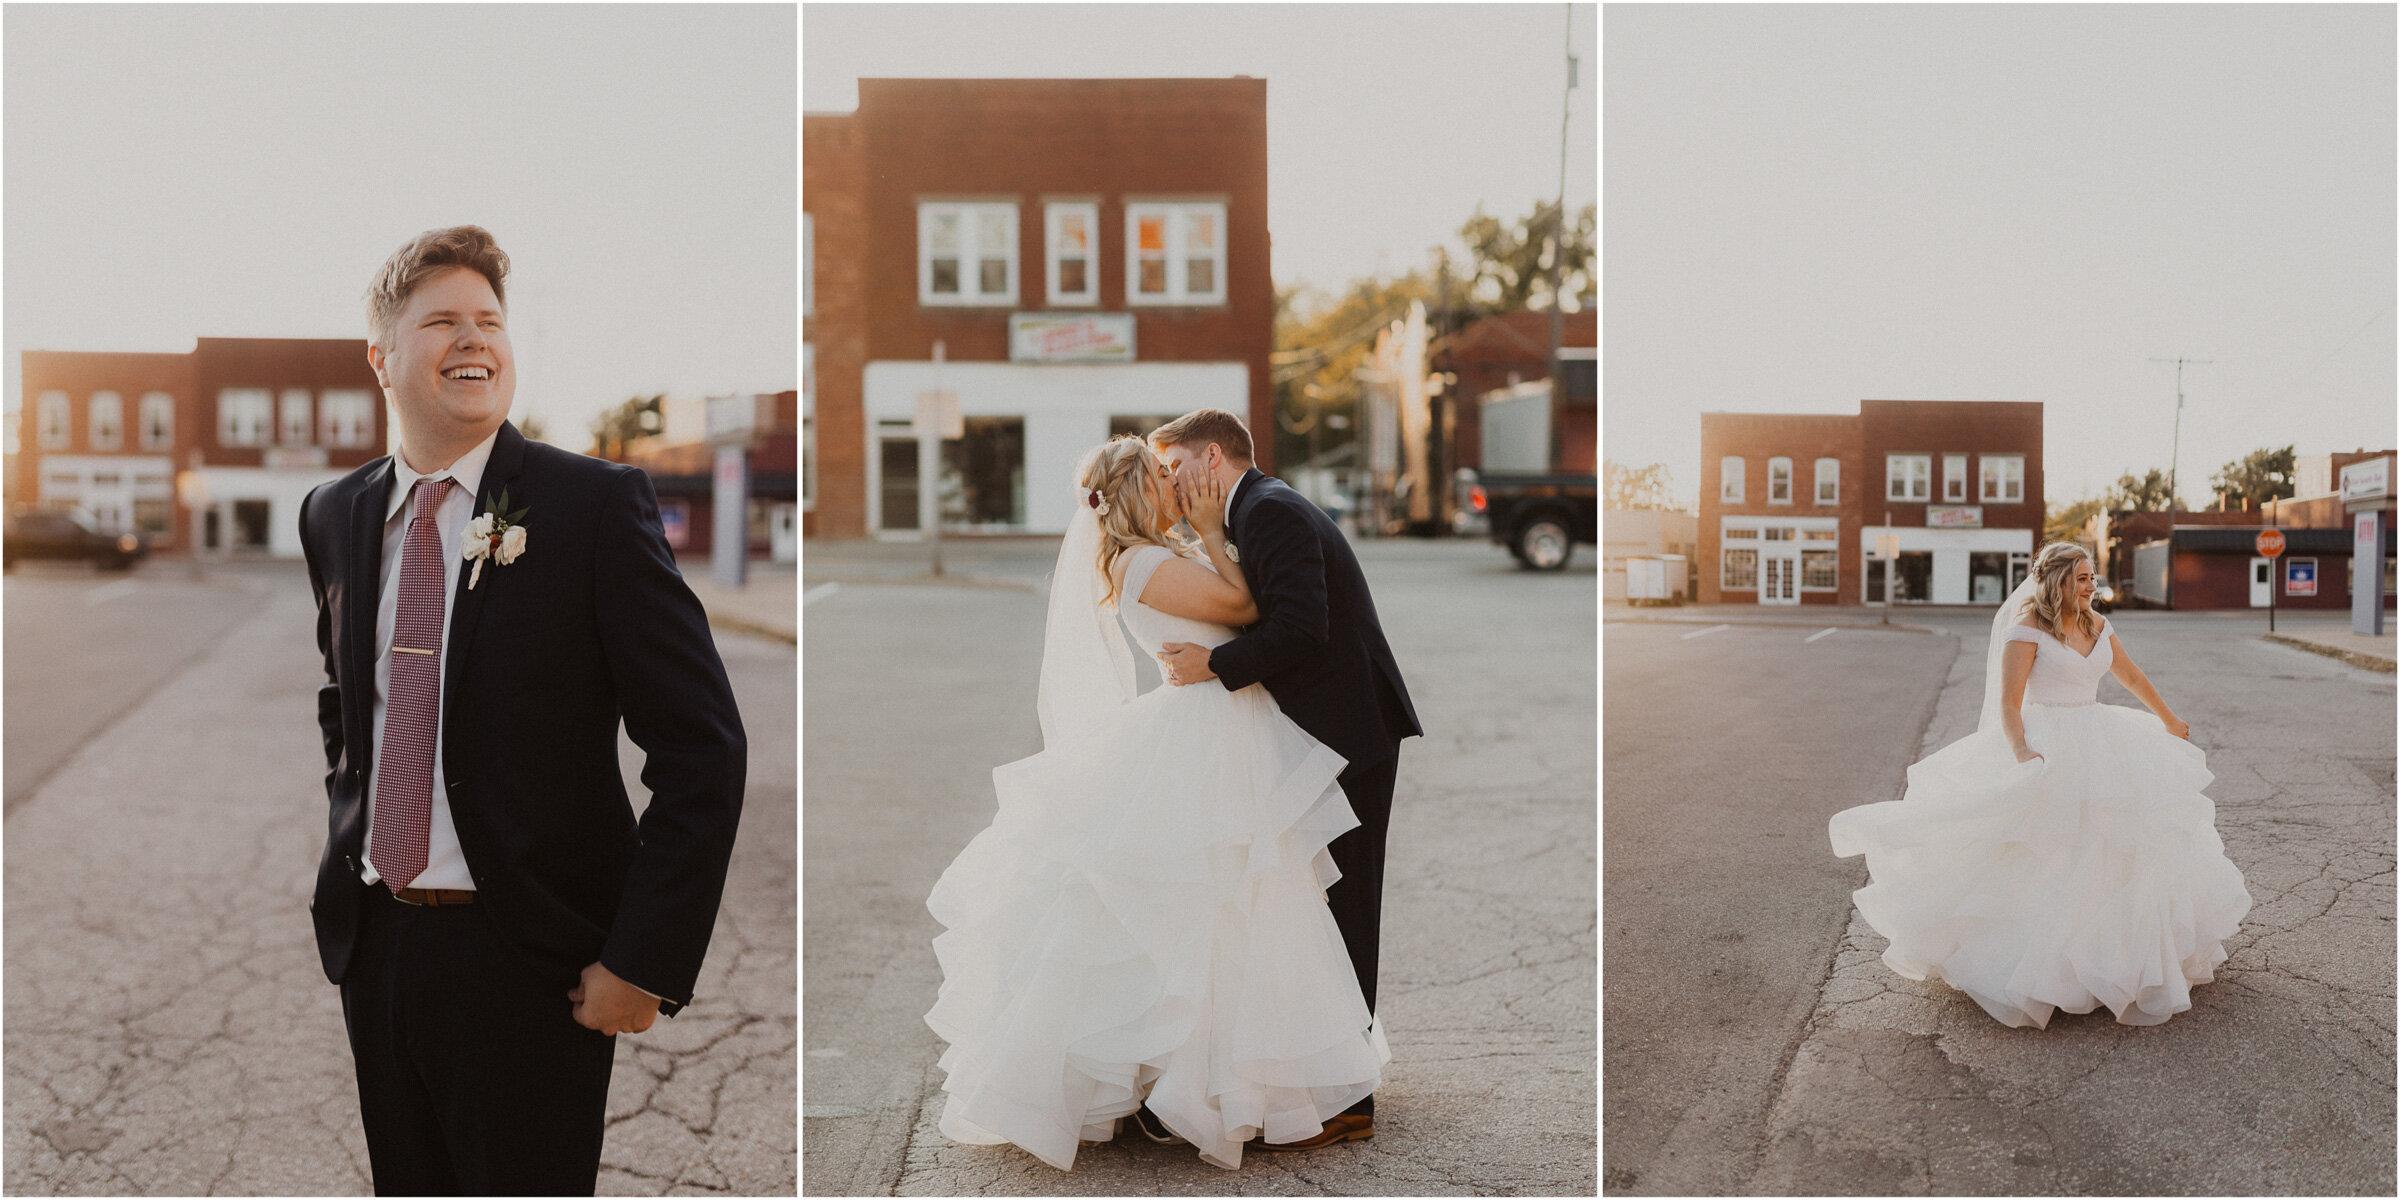 alyssa barletter photography town square paola wedding-43.jpg